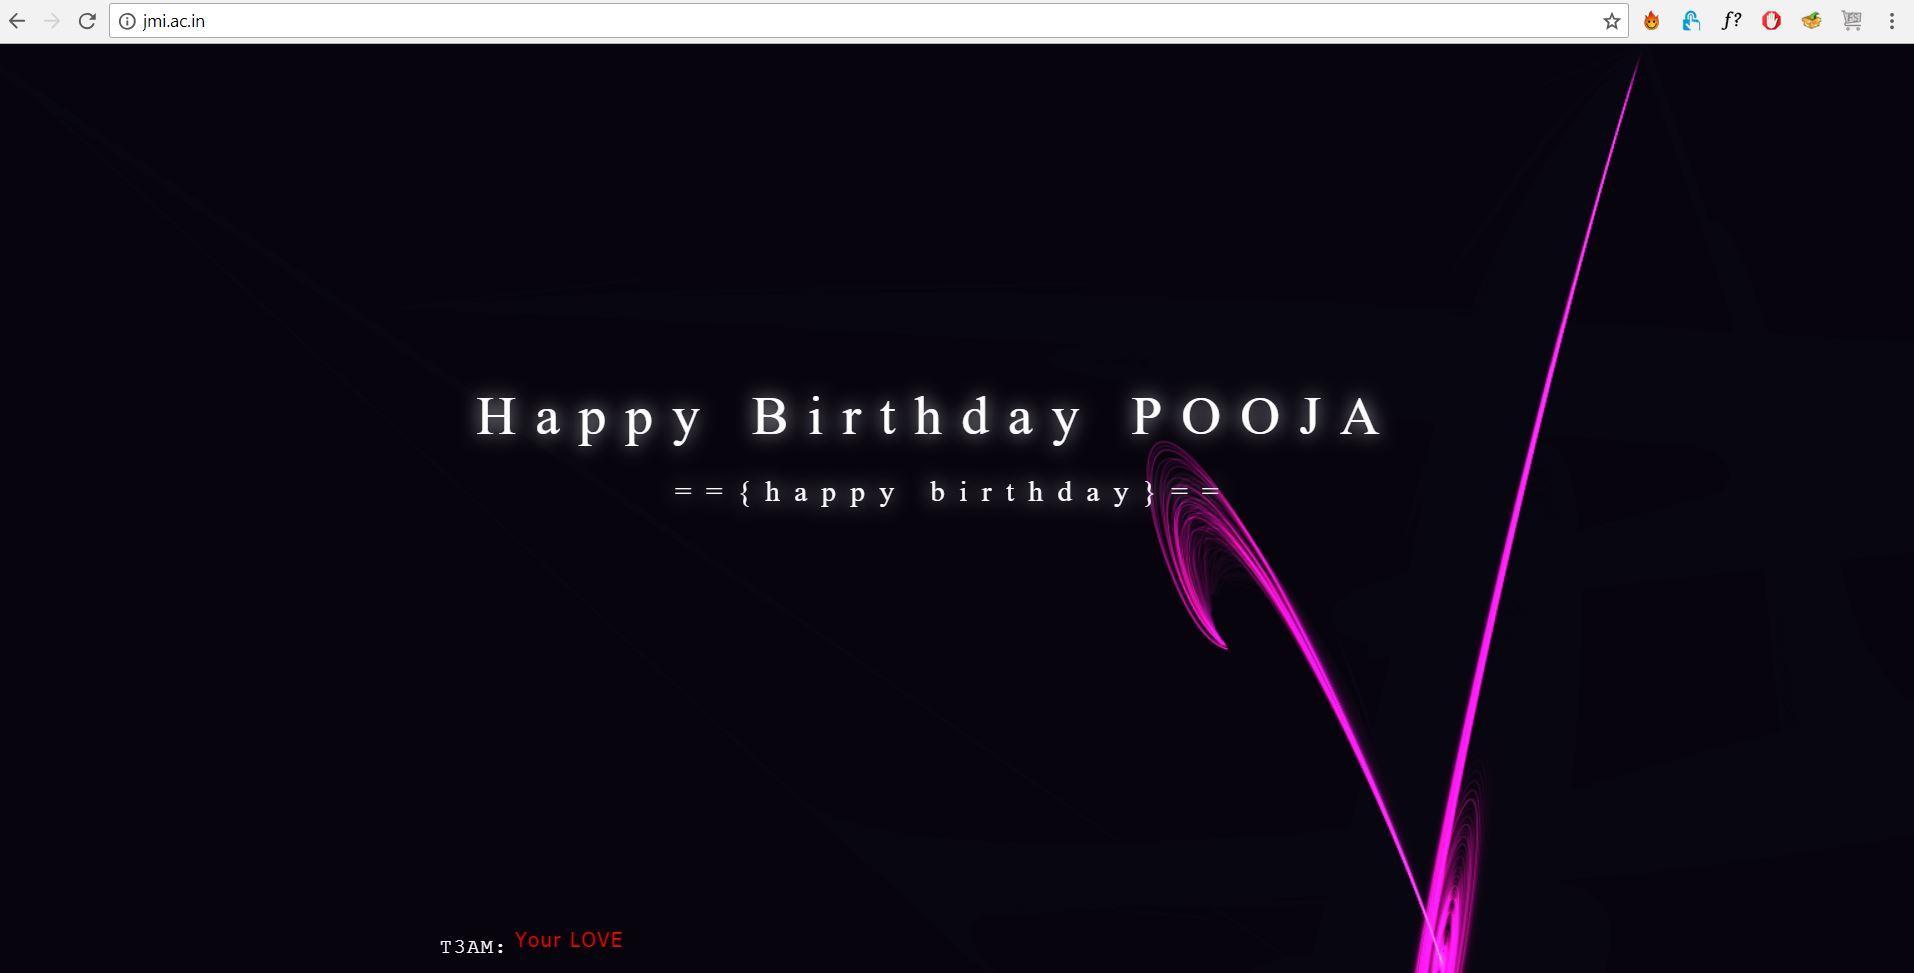 jmi website hacked